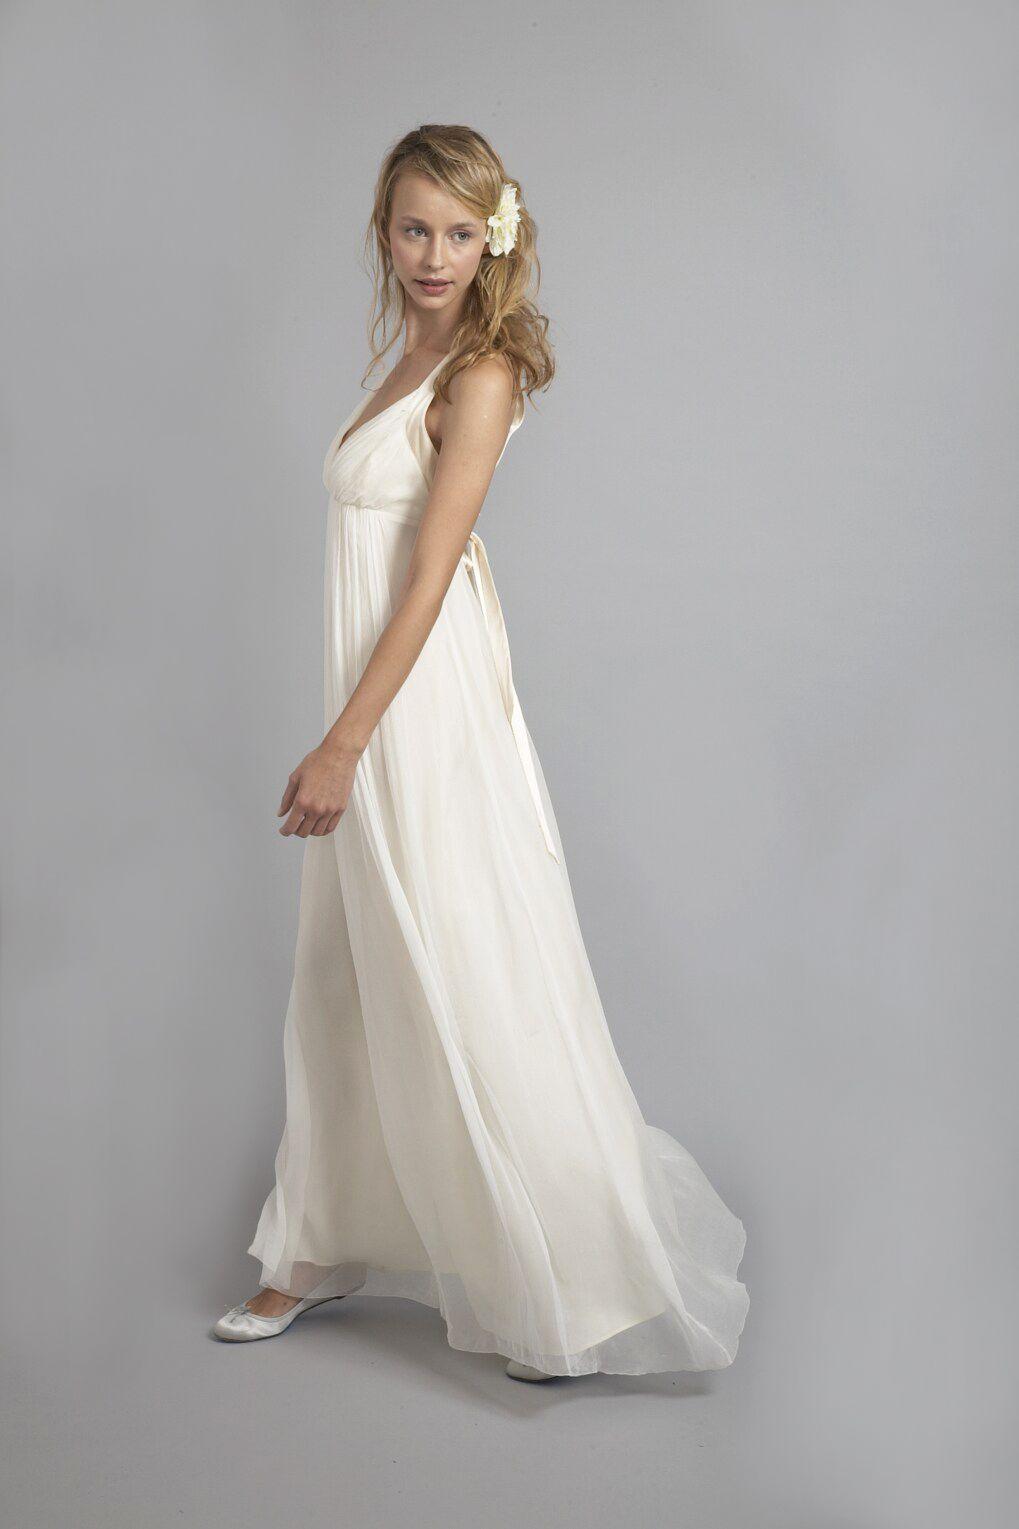 Hb6639 Racer Back Modern Wedding Dress Wedding Dresses Modern Wedding Dress Dresses